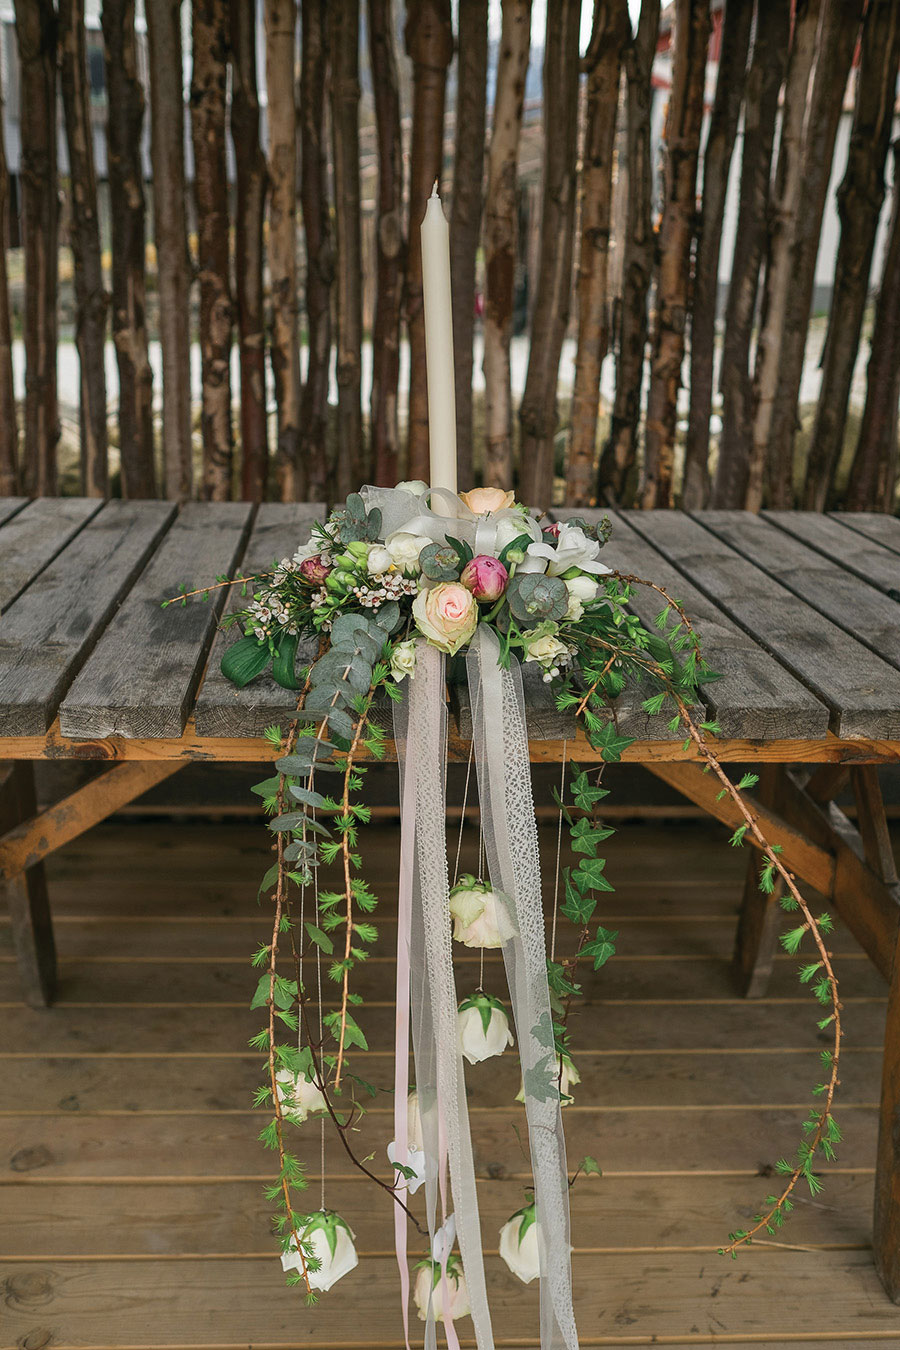 breathtaking-scenic-wedding-in-norway20160914_0101